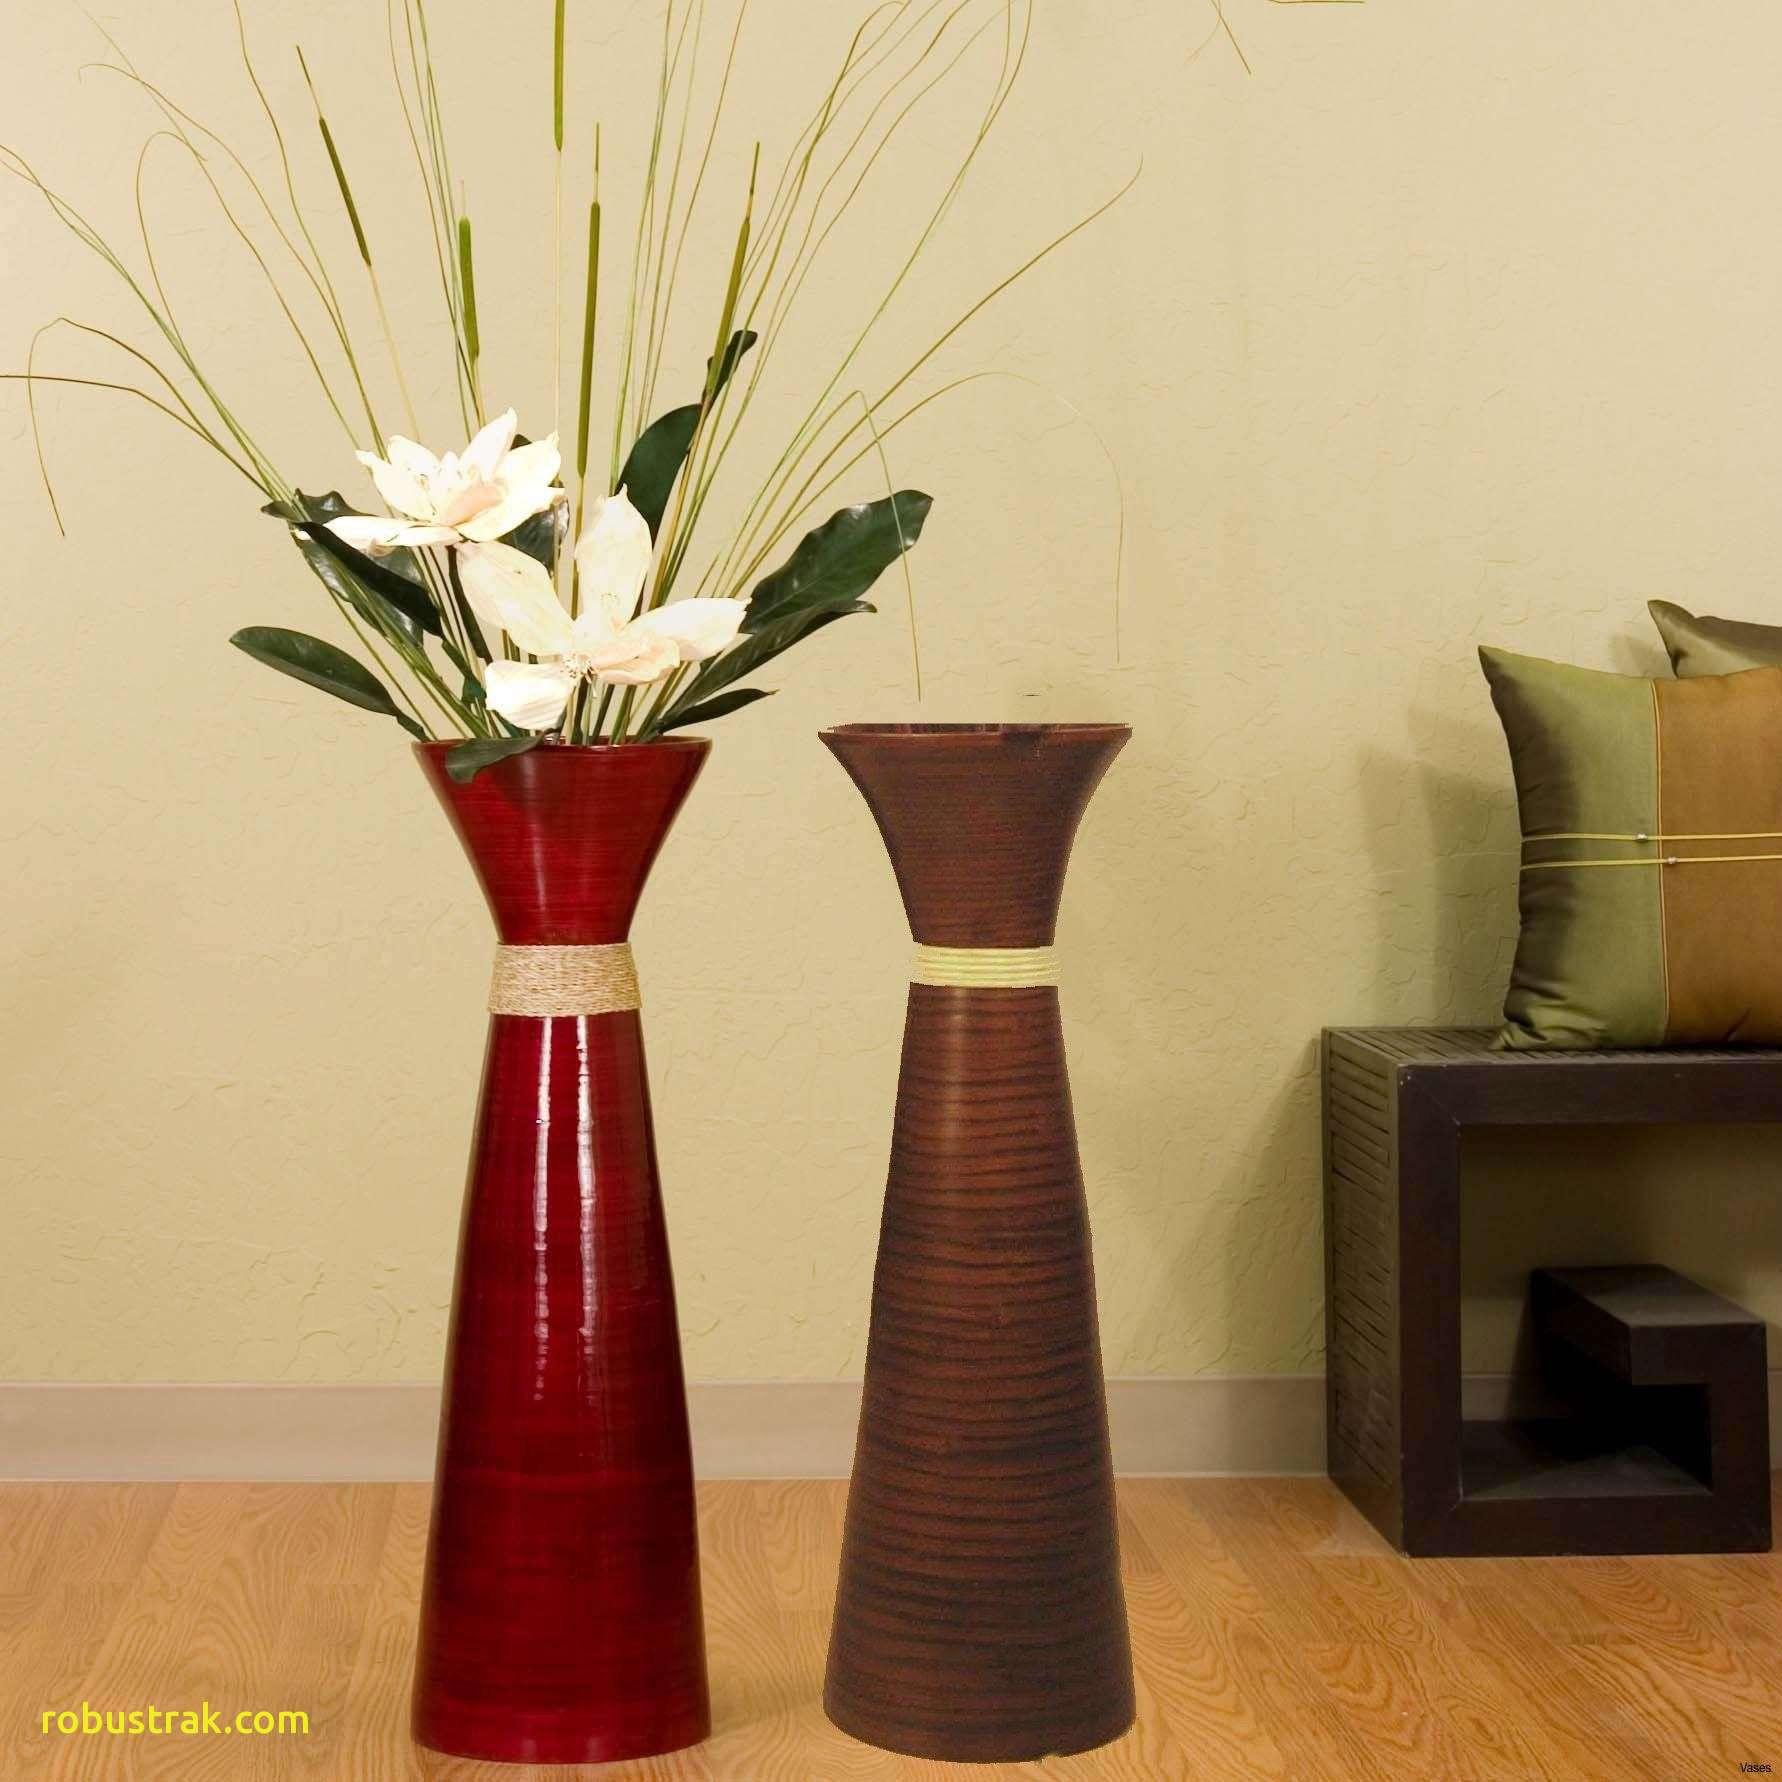 10 Nice Big Vases For Cheap Decorative Vase Ideas